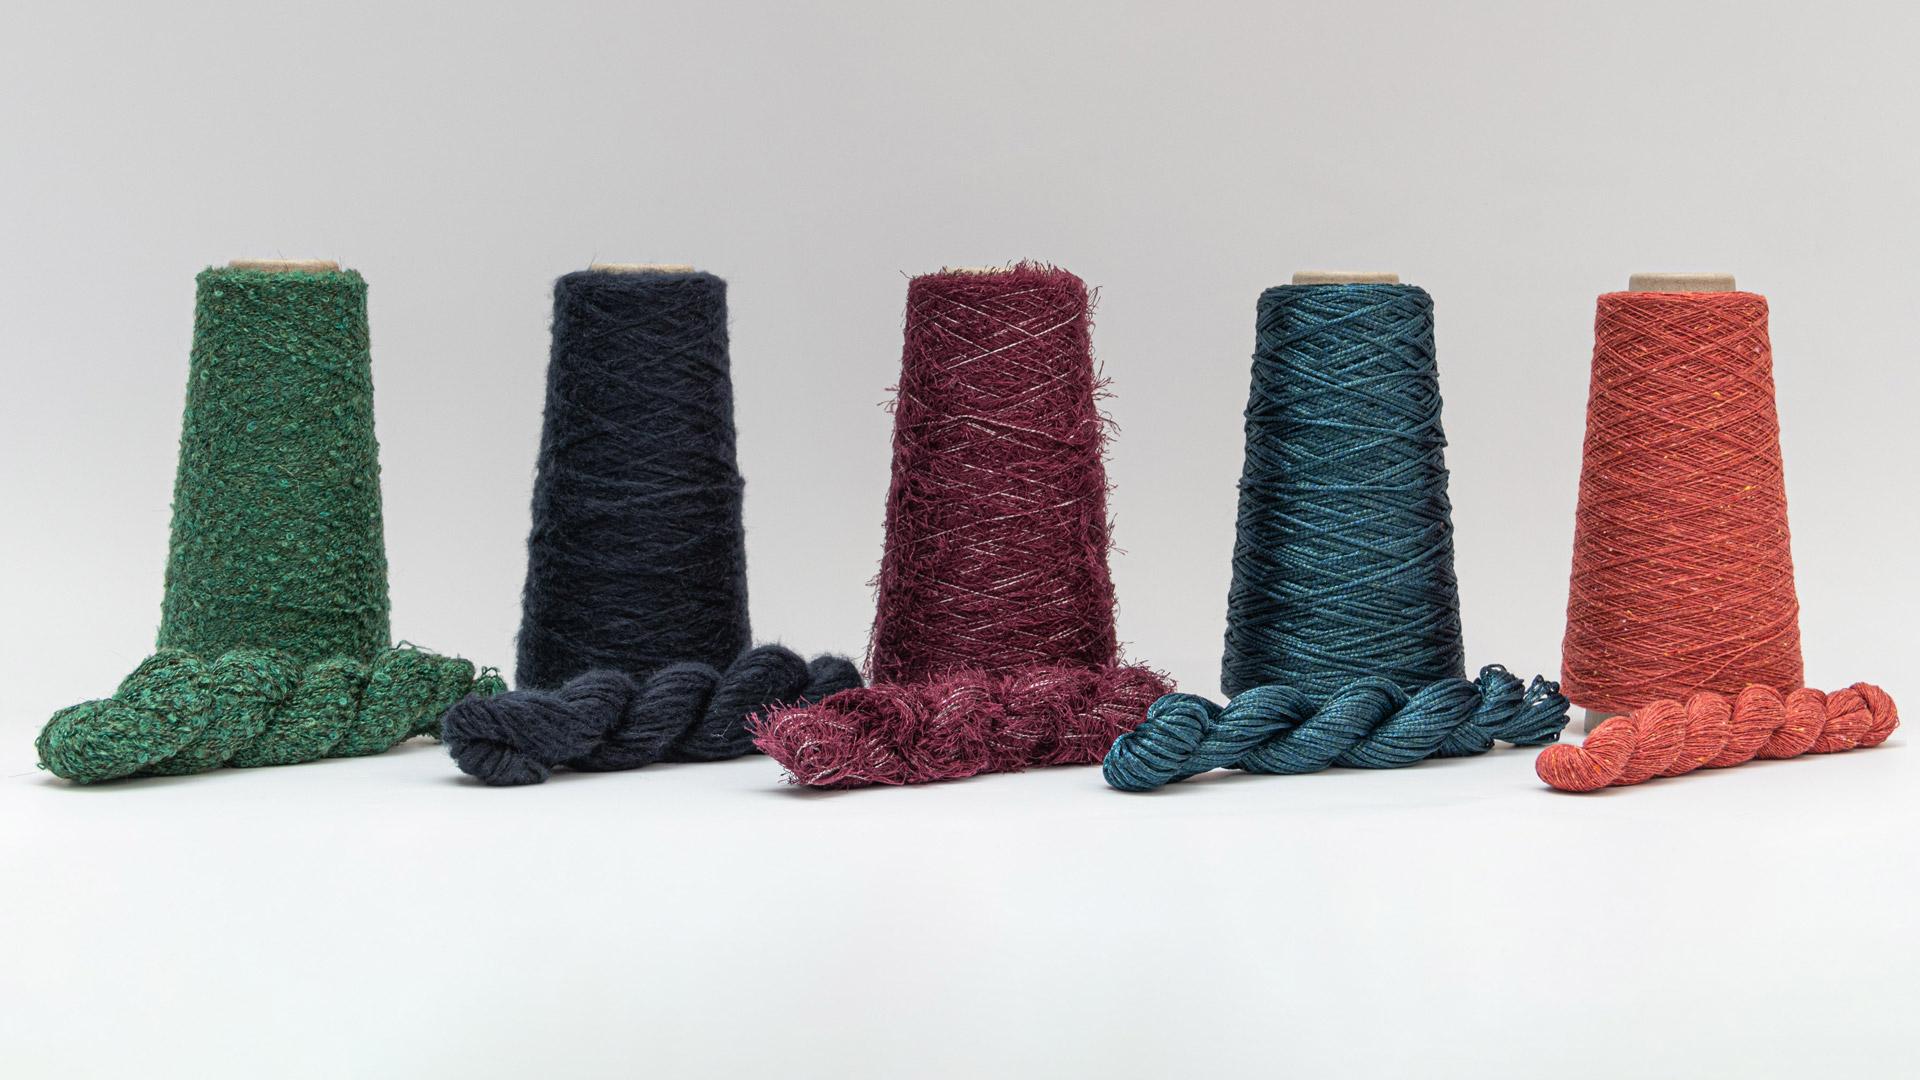 Spink-Aker FW 22-23 knitting